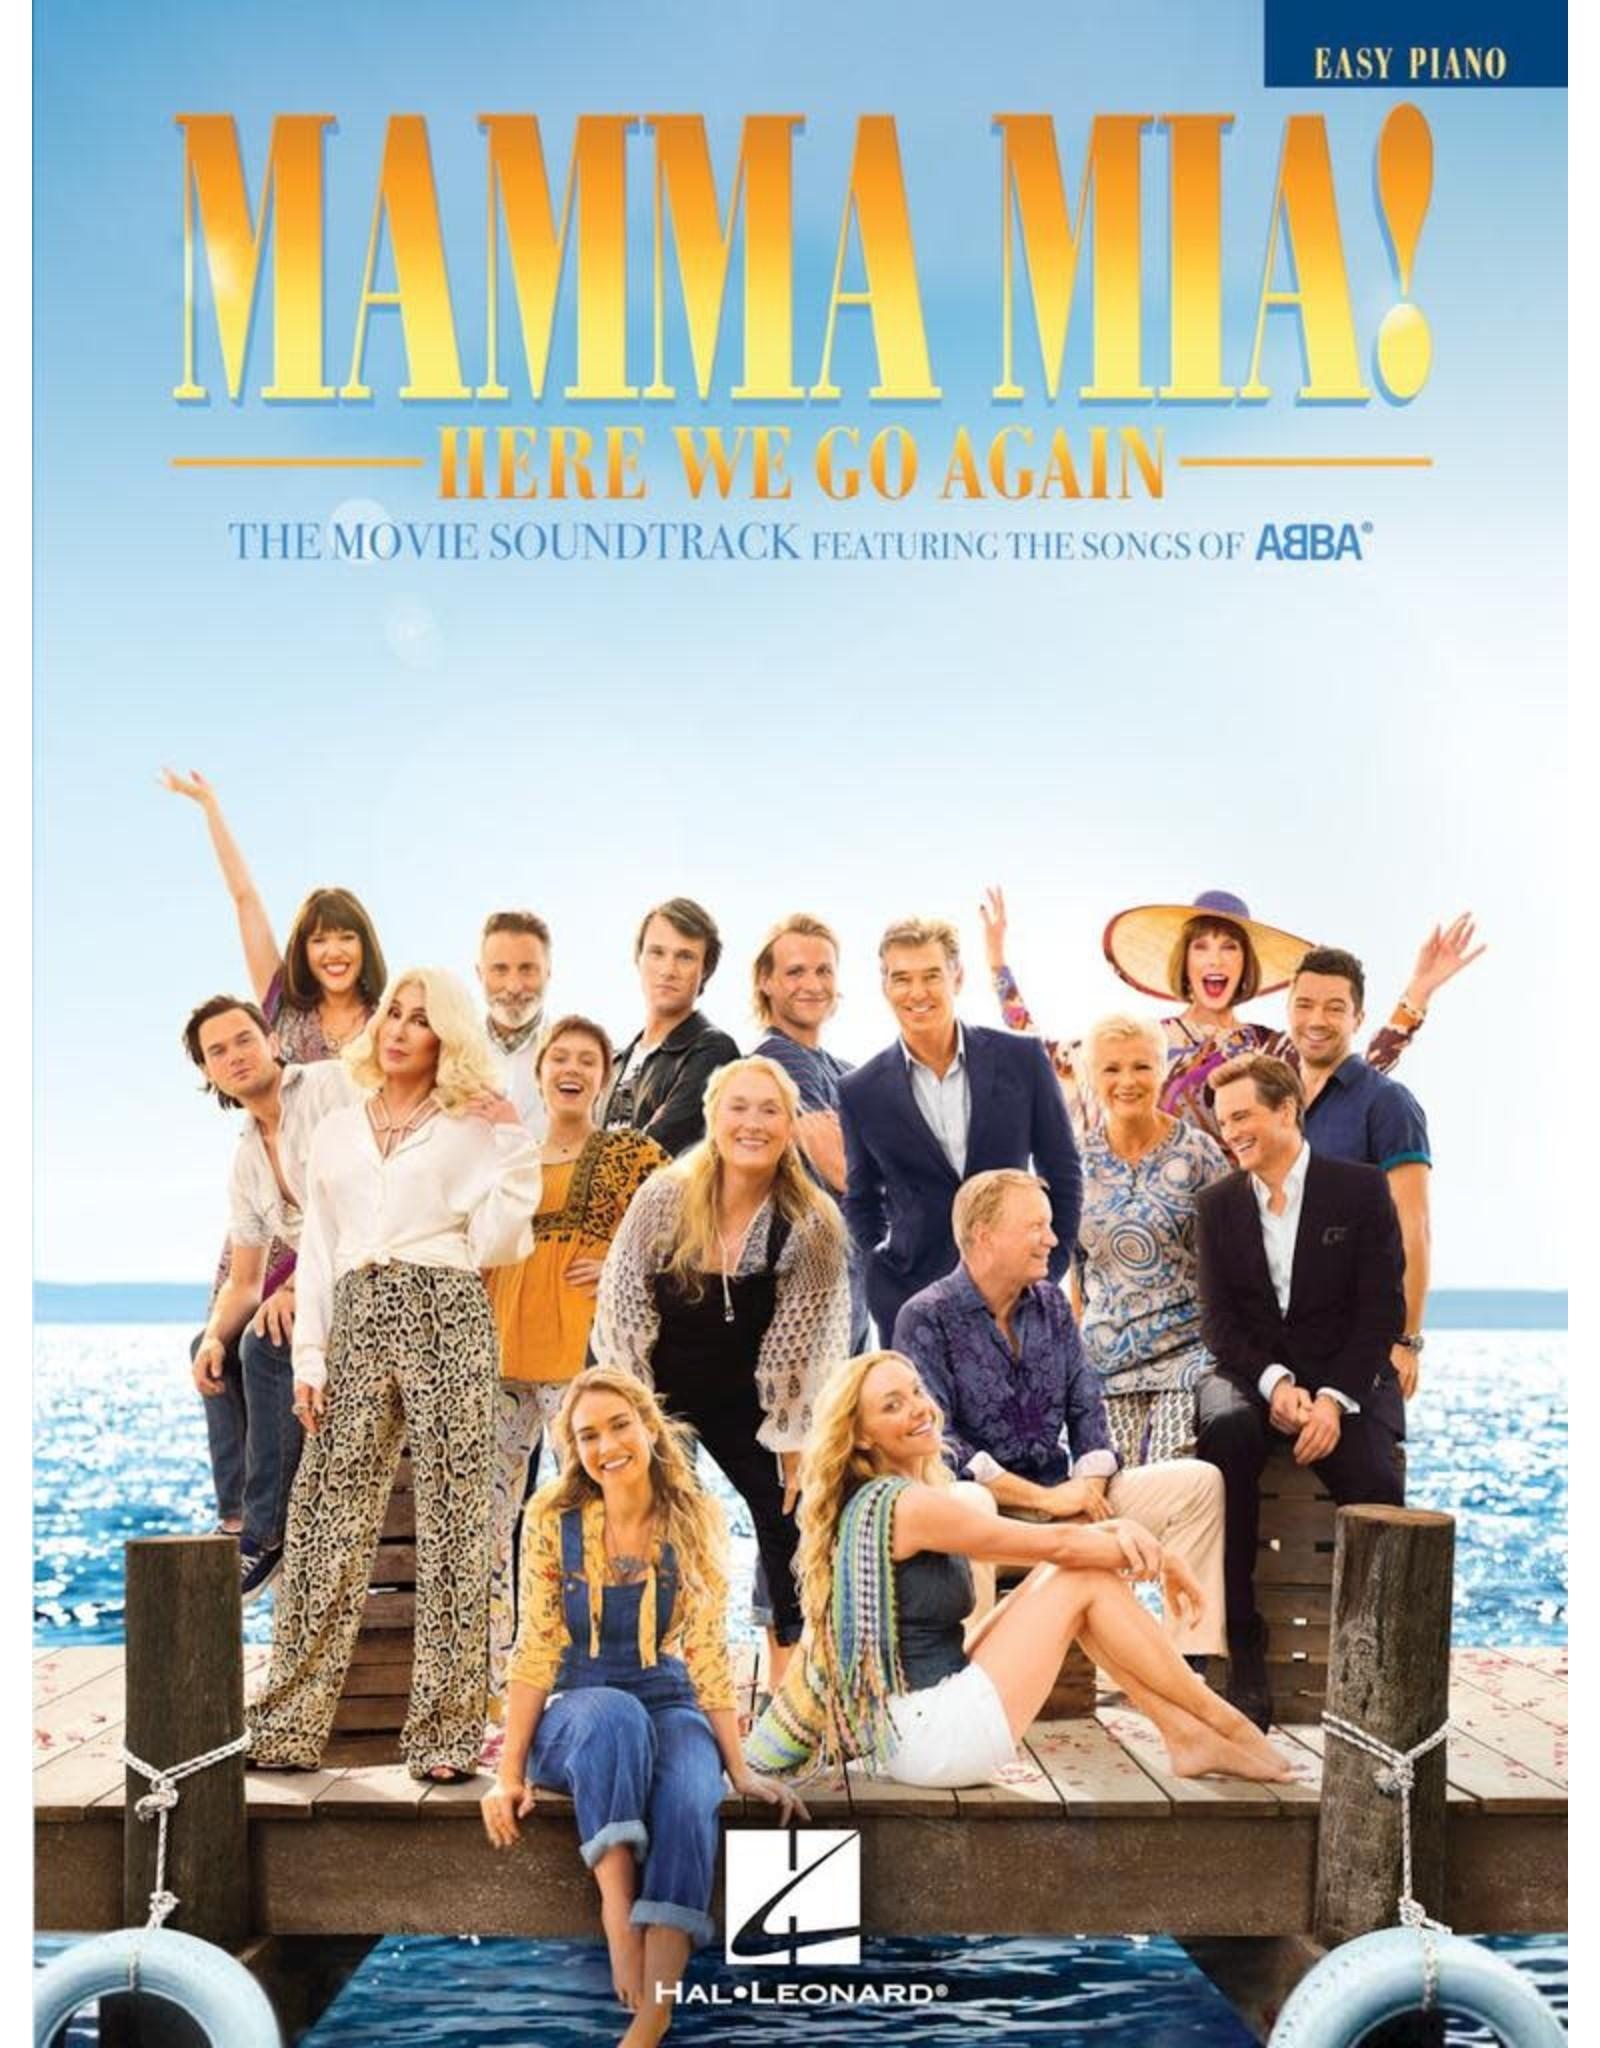 Hal Leonard Mamma Mia! Here We Go Again Movie - Easy Piano